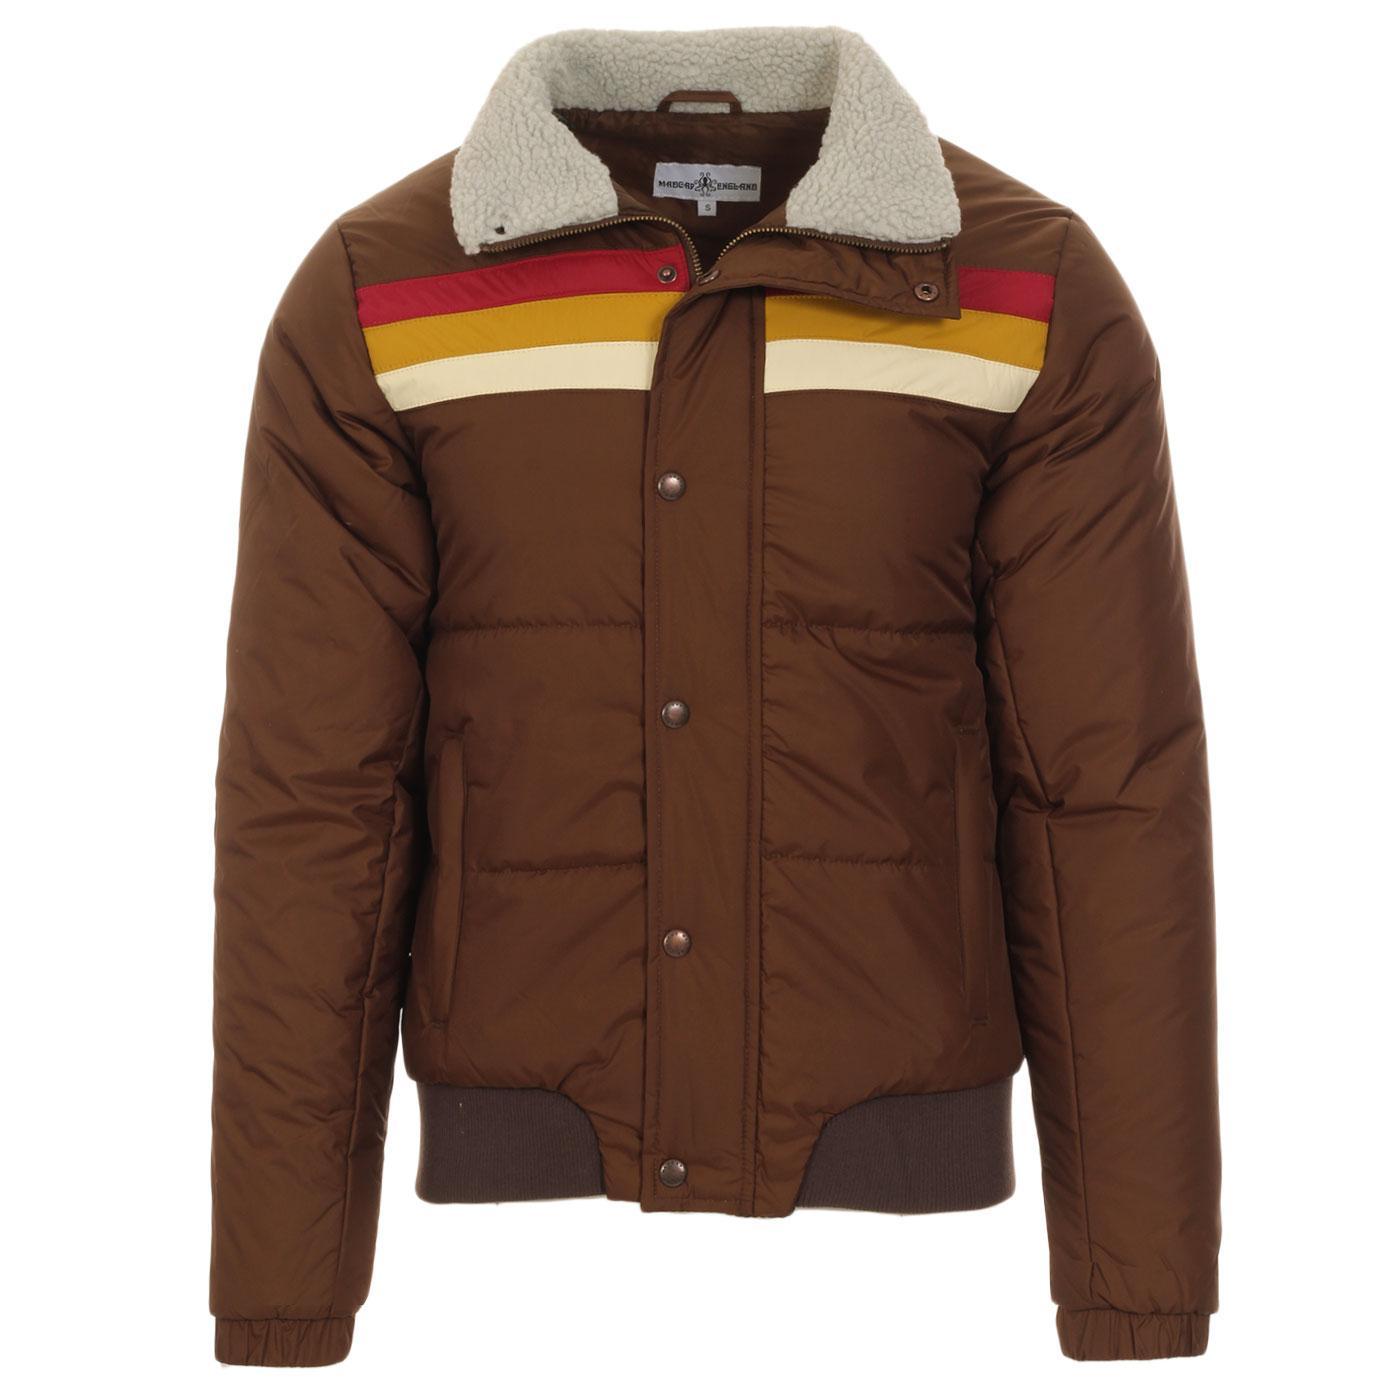 Madcap England Edge Men's Retro 1970s Rainbow Stripe Ski Jacket in Carafe Brown